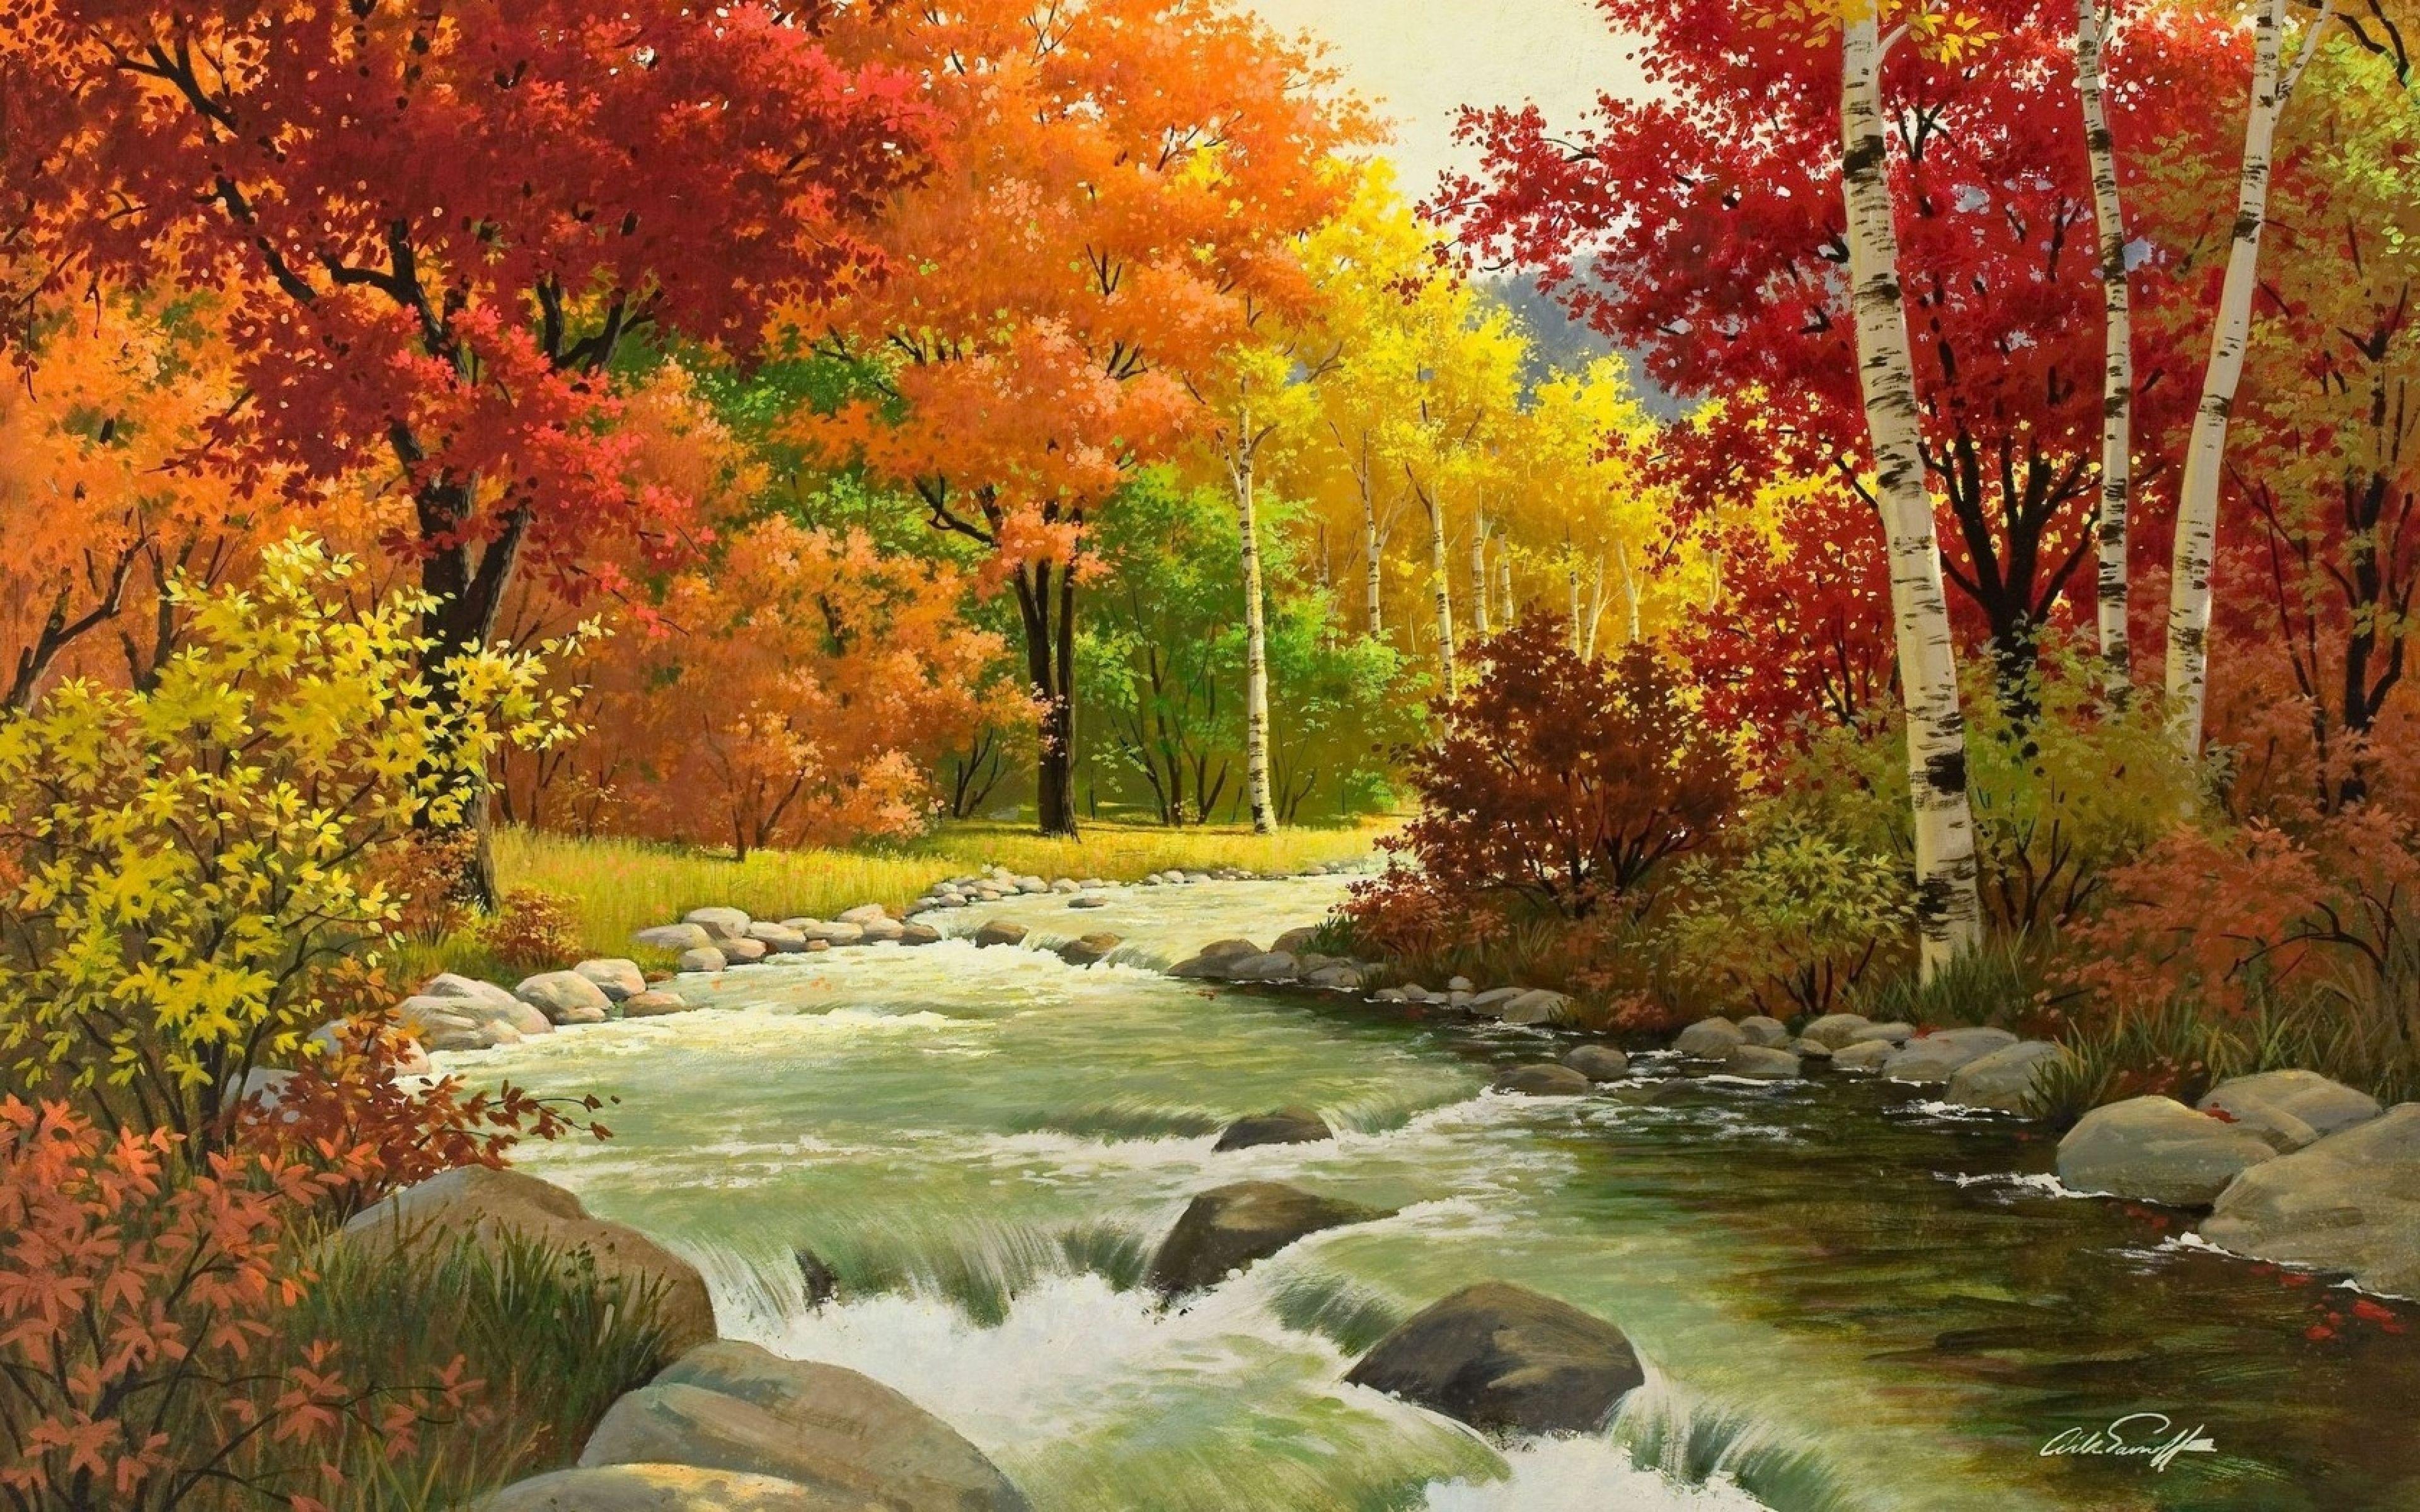 Landscape Paintings Full Hd , HD Wallpaper & Backgrounds